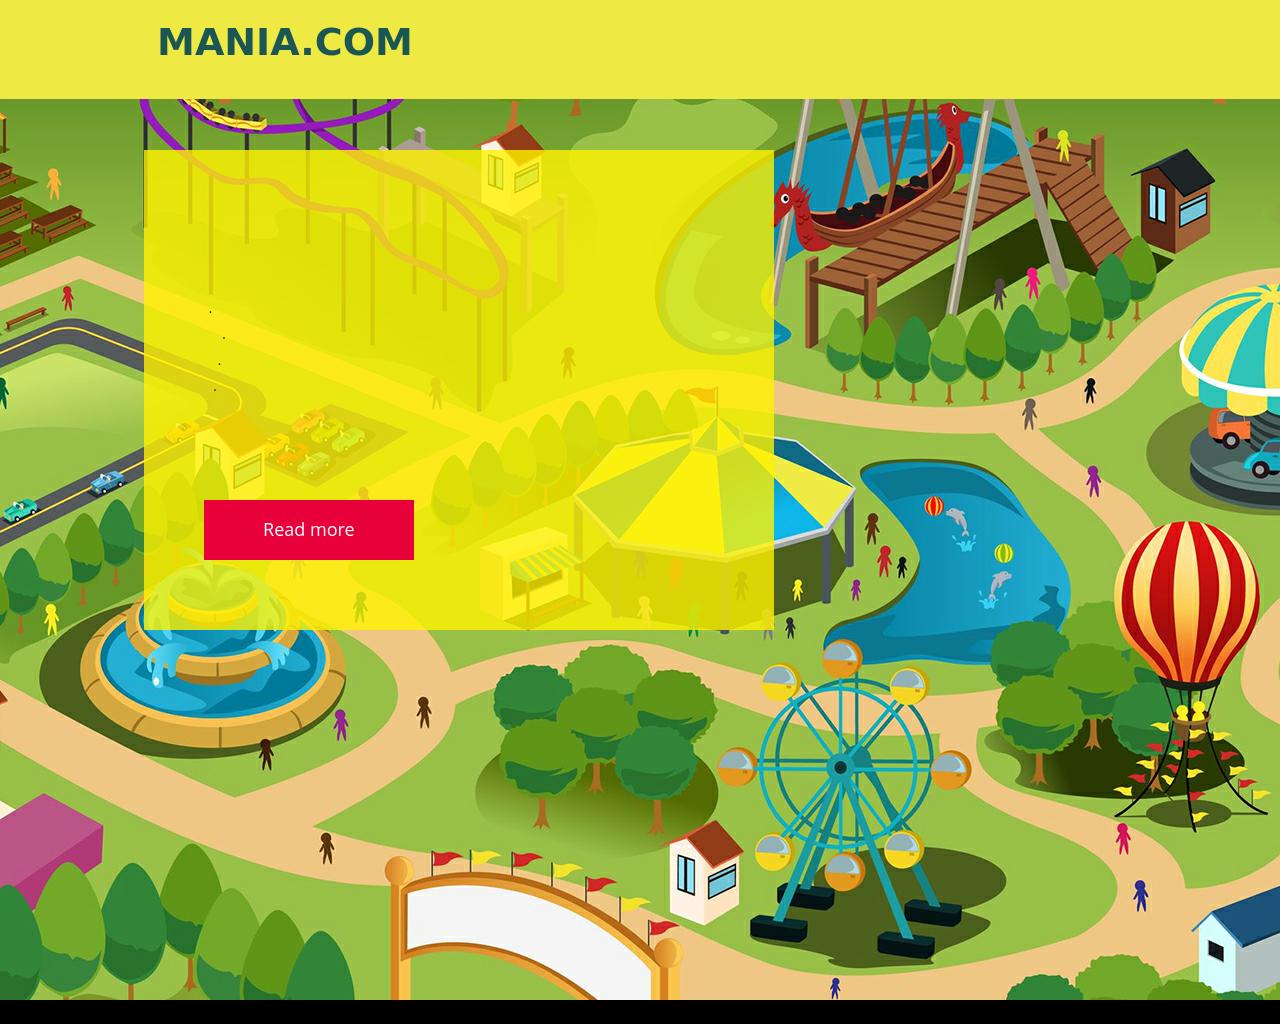 Mania-Advertising-Reviews-Pricing